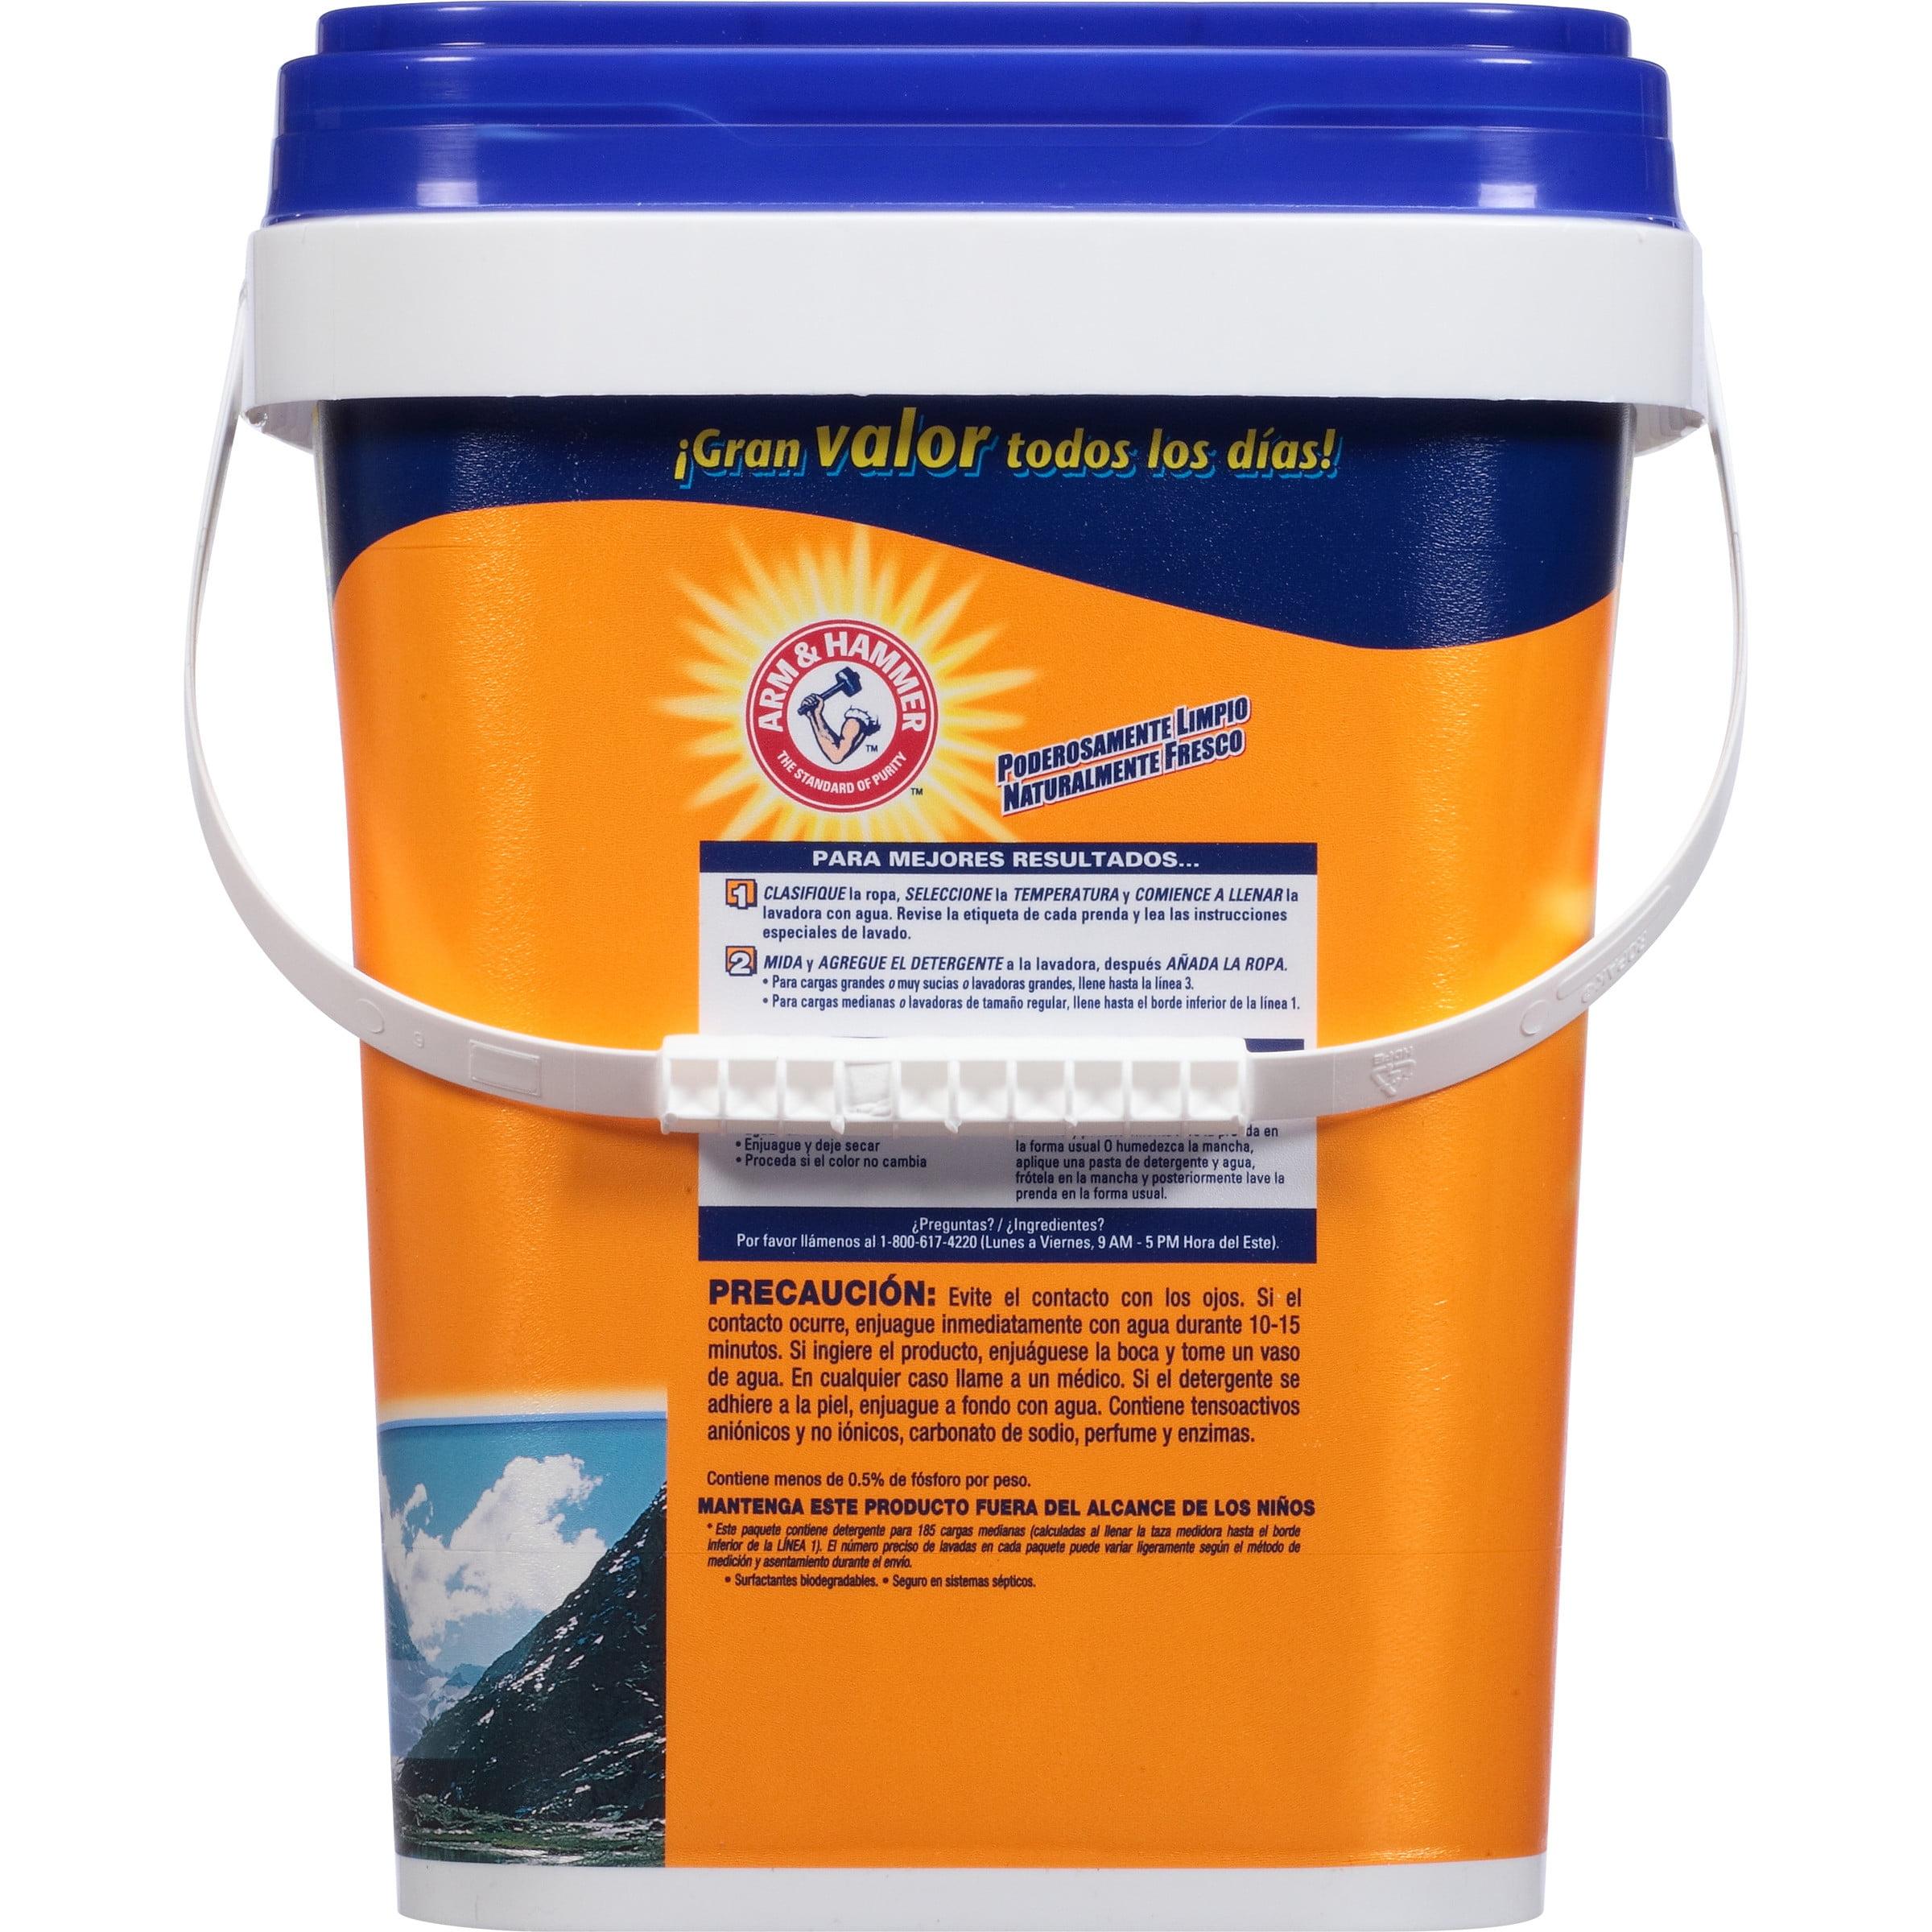 4b00371e Arm & Hammer Powder Laundry Detergent, Alpine Clean, 155 Loads 9.56 Lbs -  Walmart.com